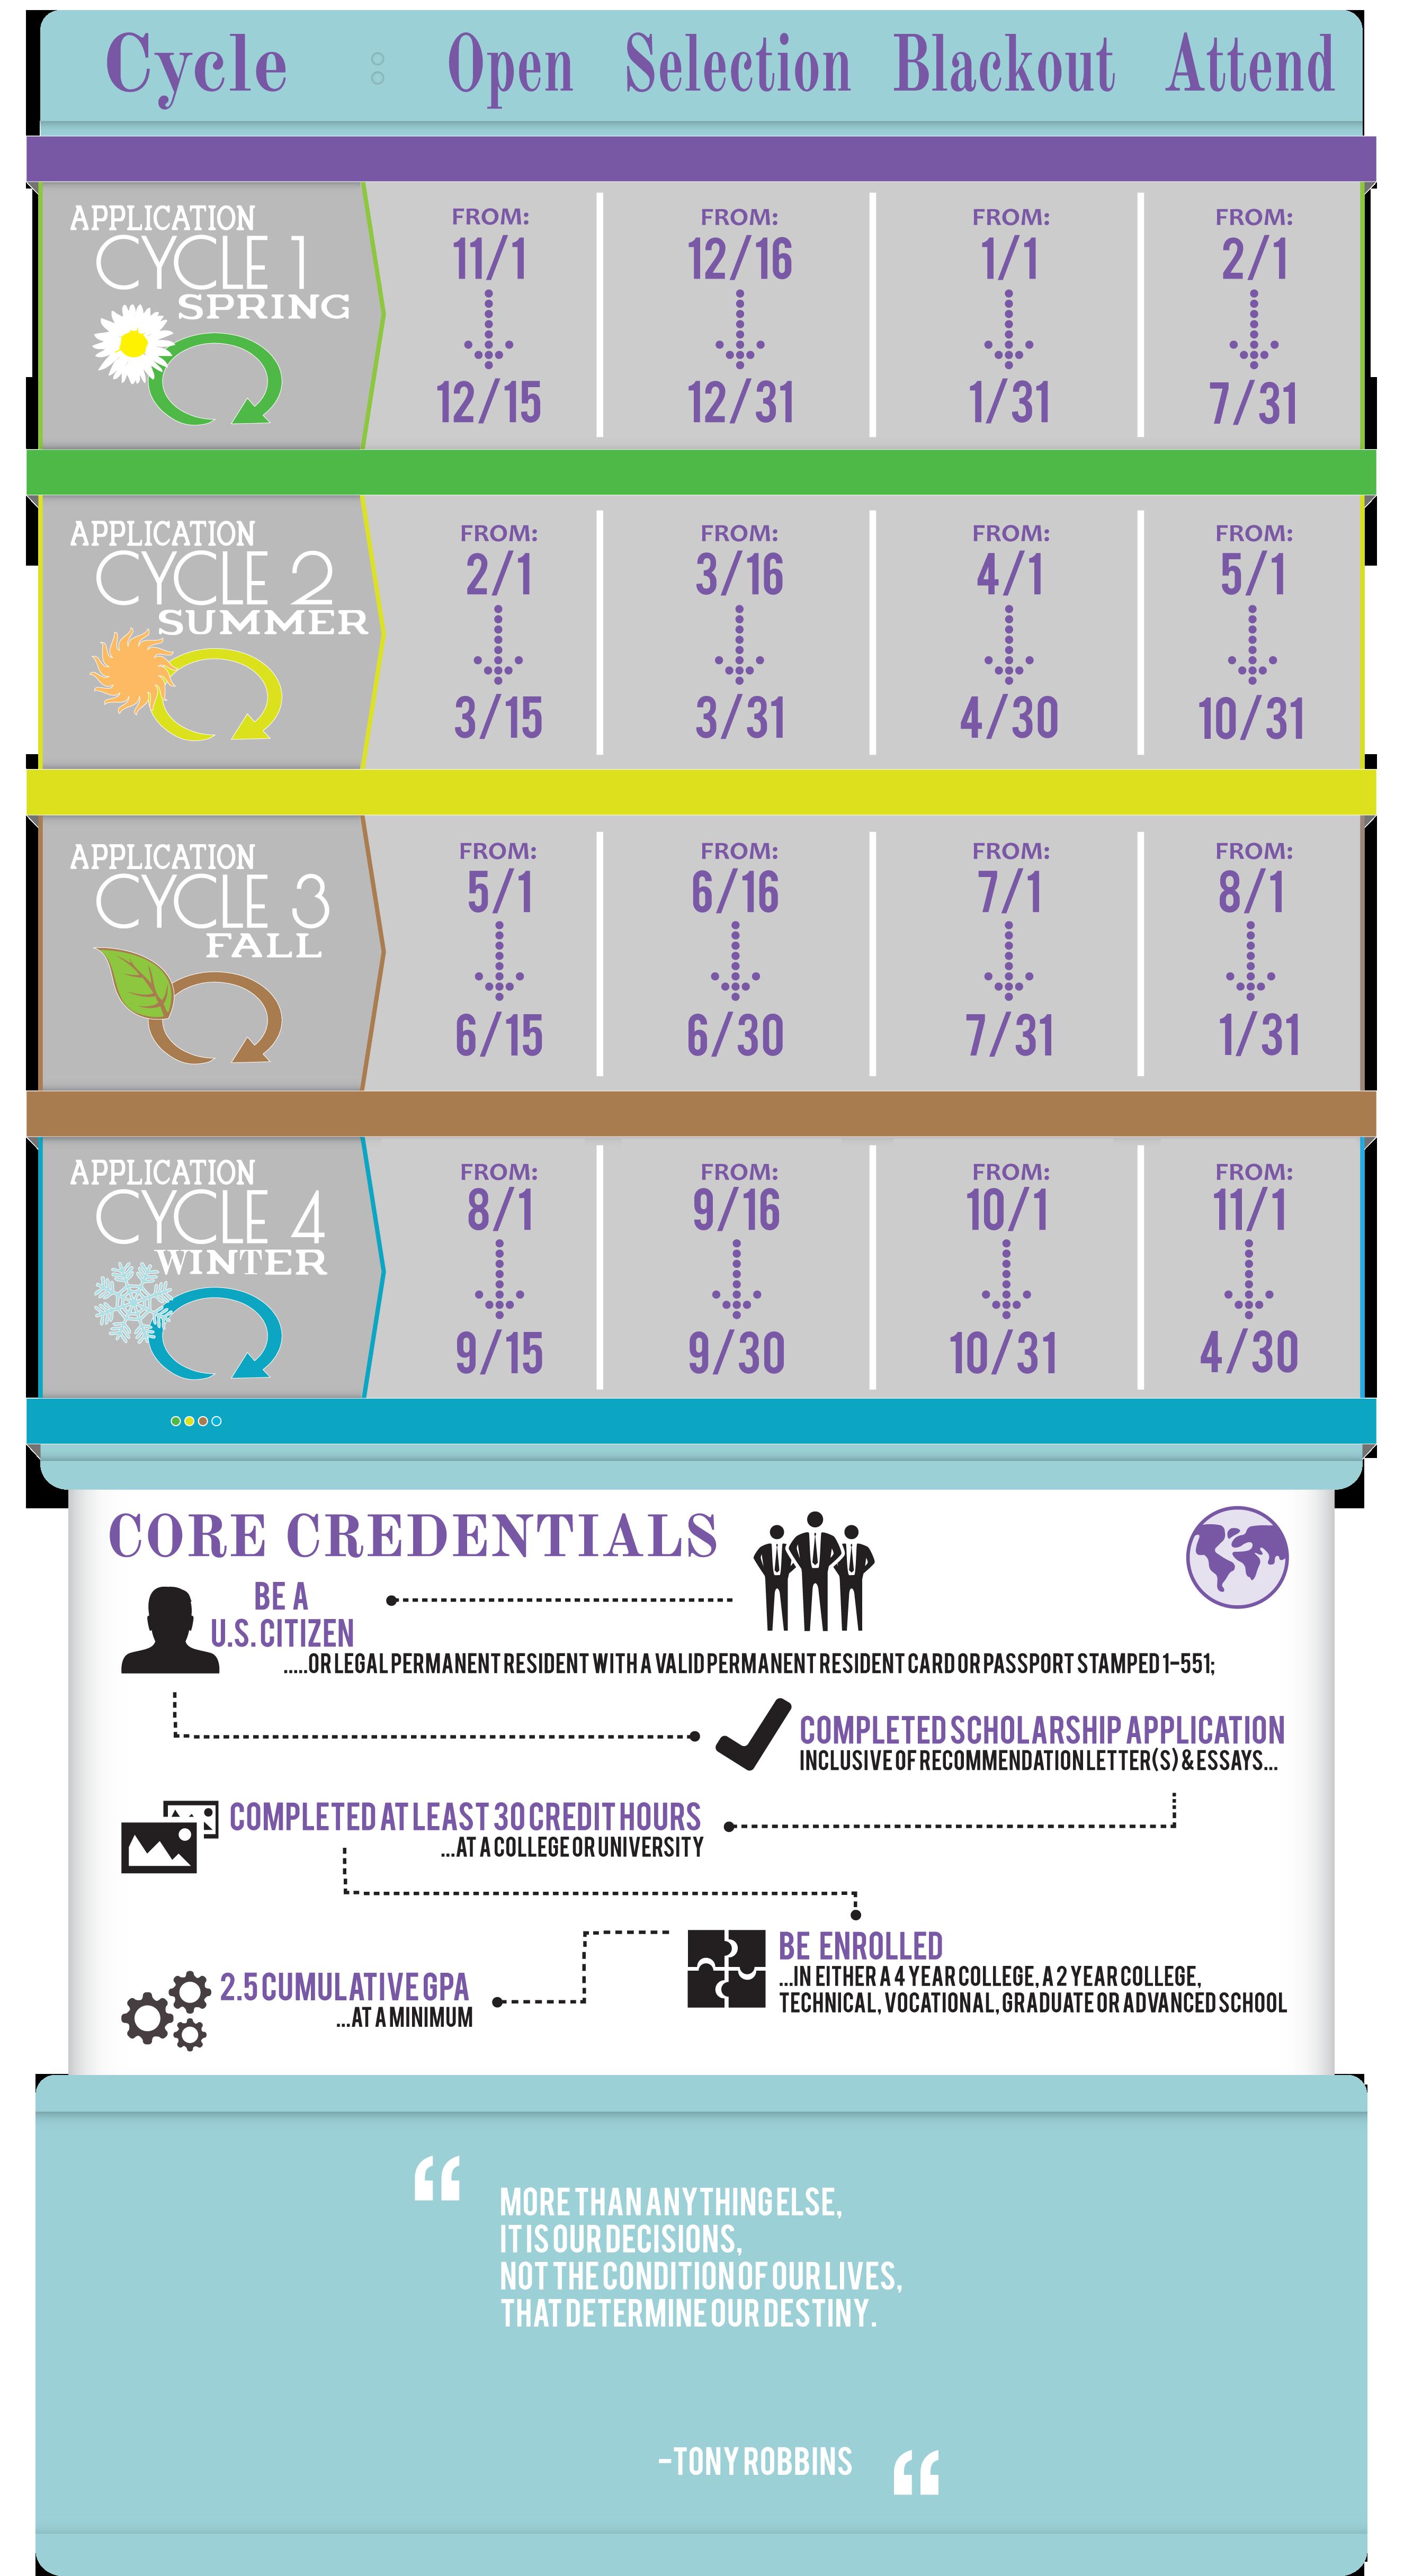 Silver Spoon Foundation student scholarship application criteria